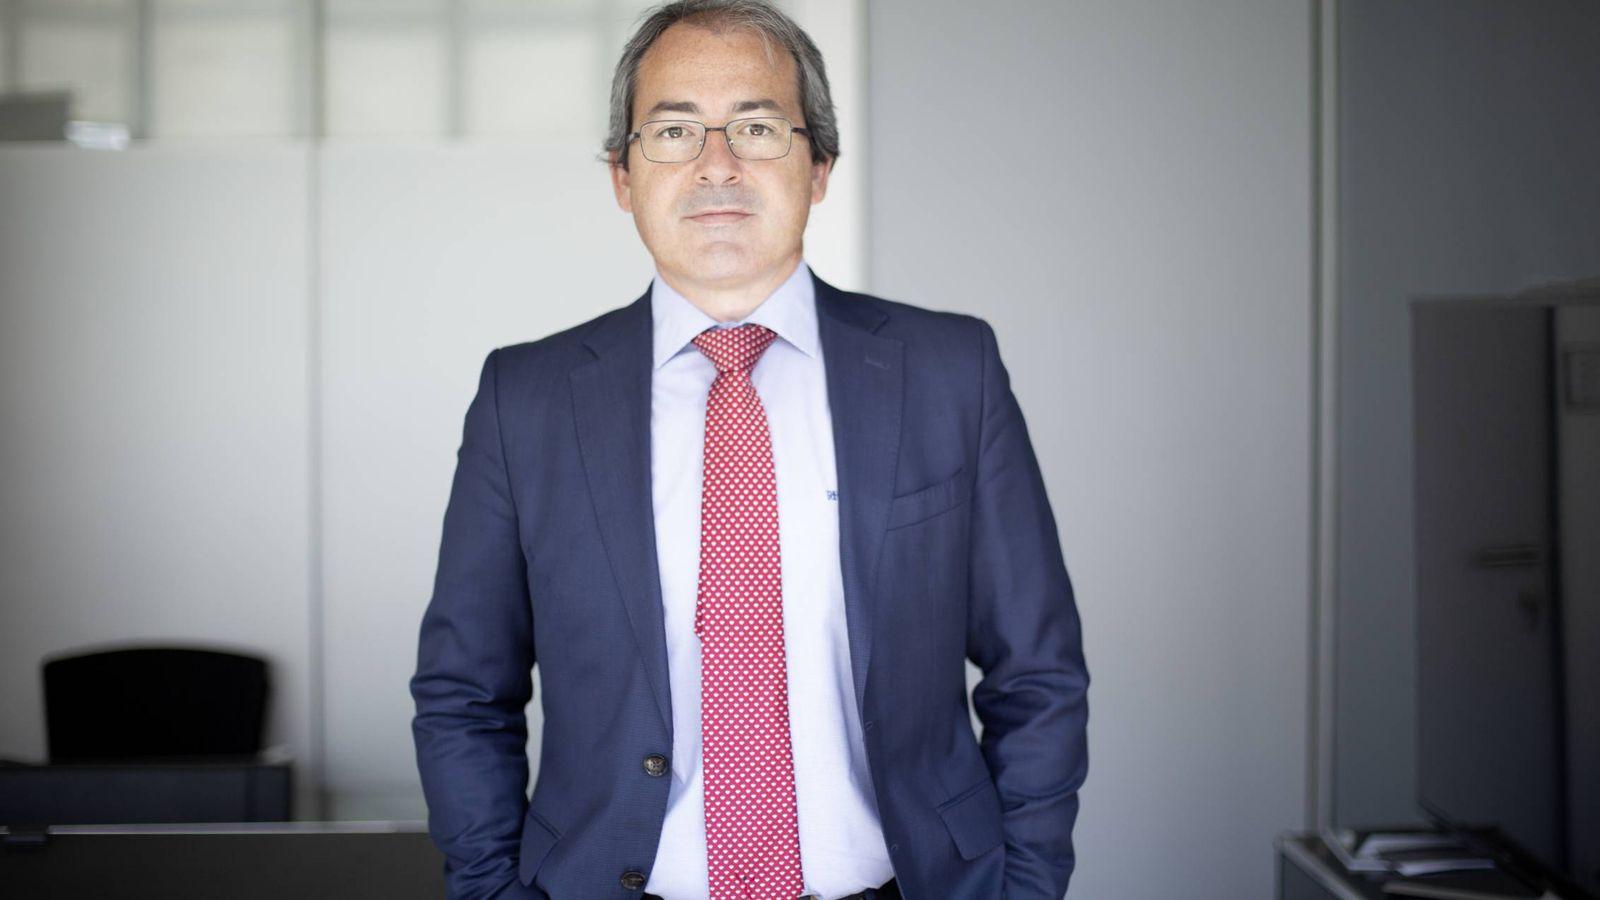 Foto: Unai Beato, data officer de Myinvestor